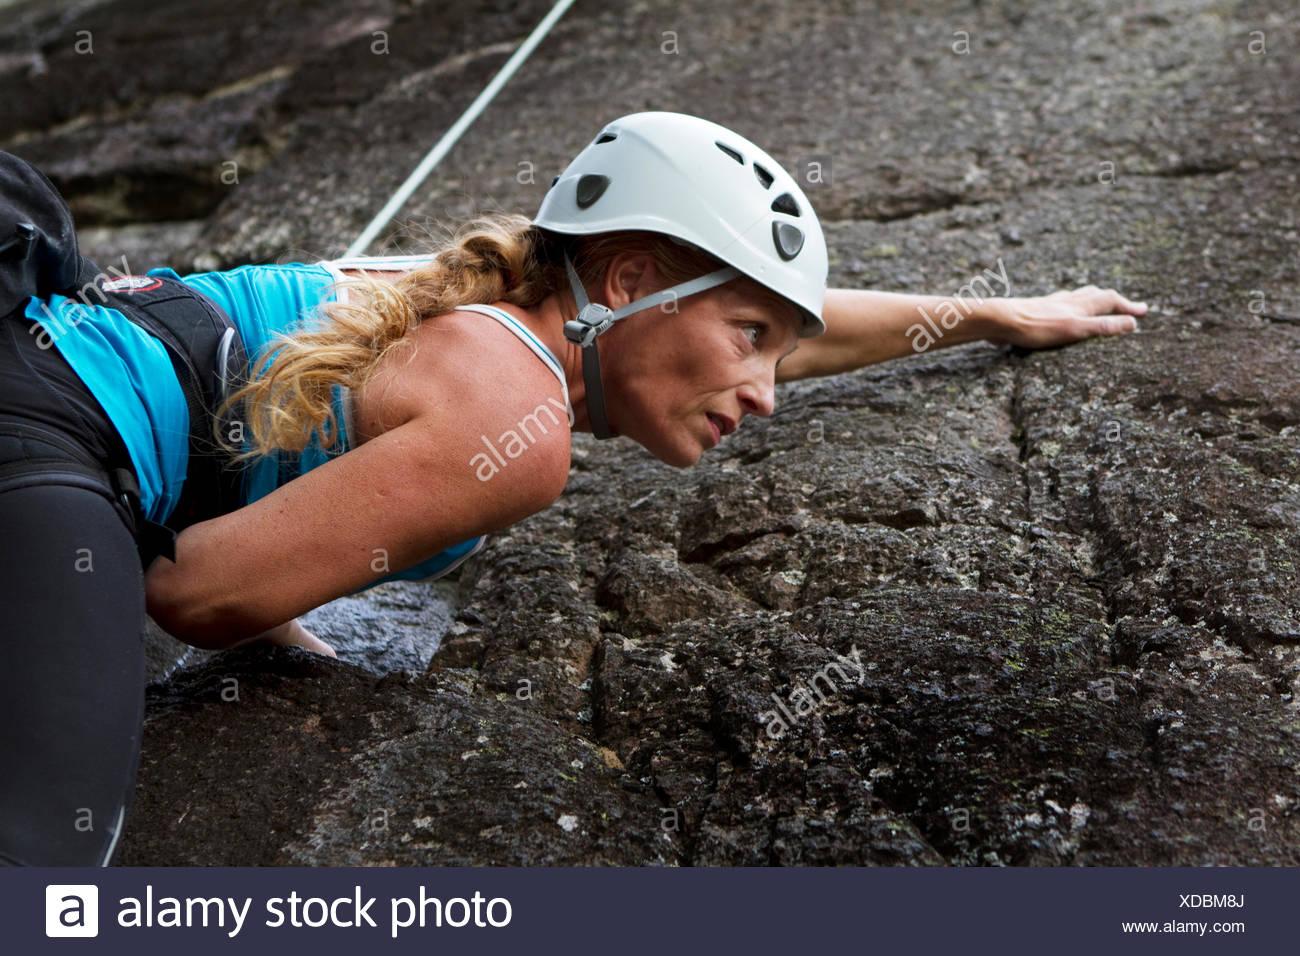 Sweden, Ostergotland, Vaderstad, Woman climbing rock - Stock Image